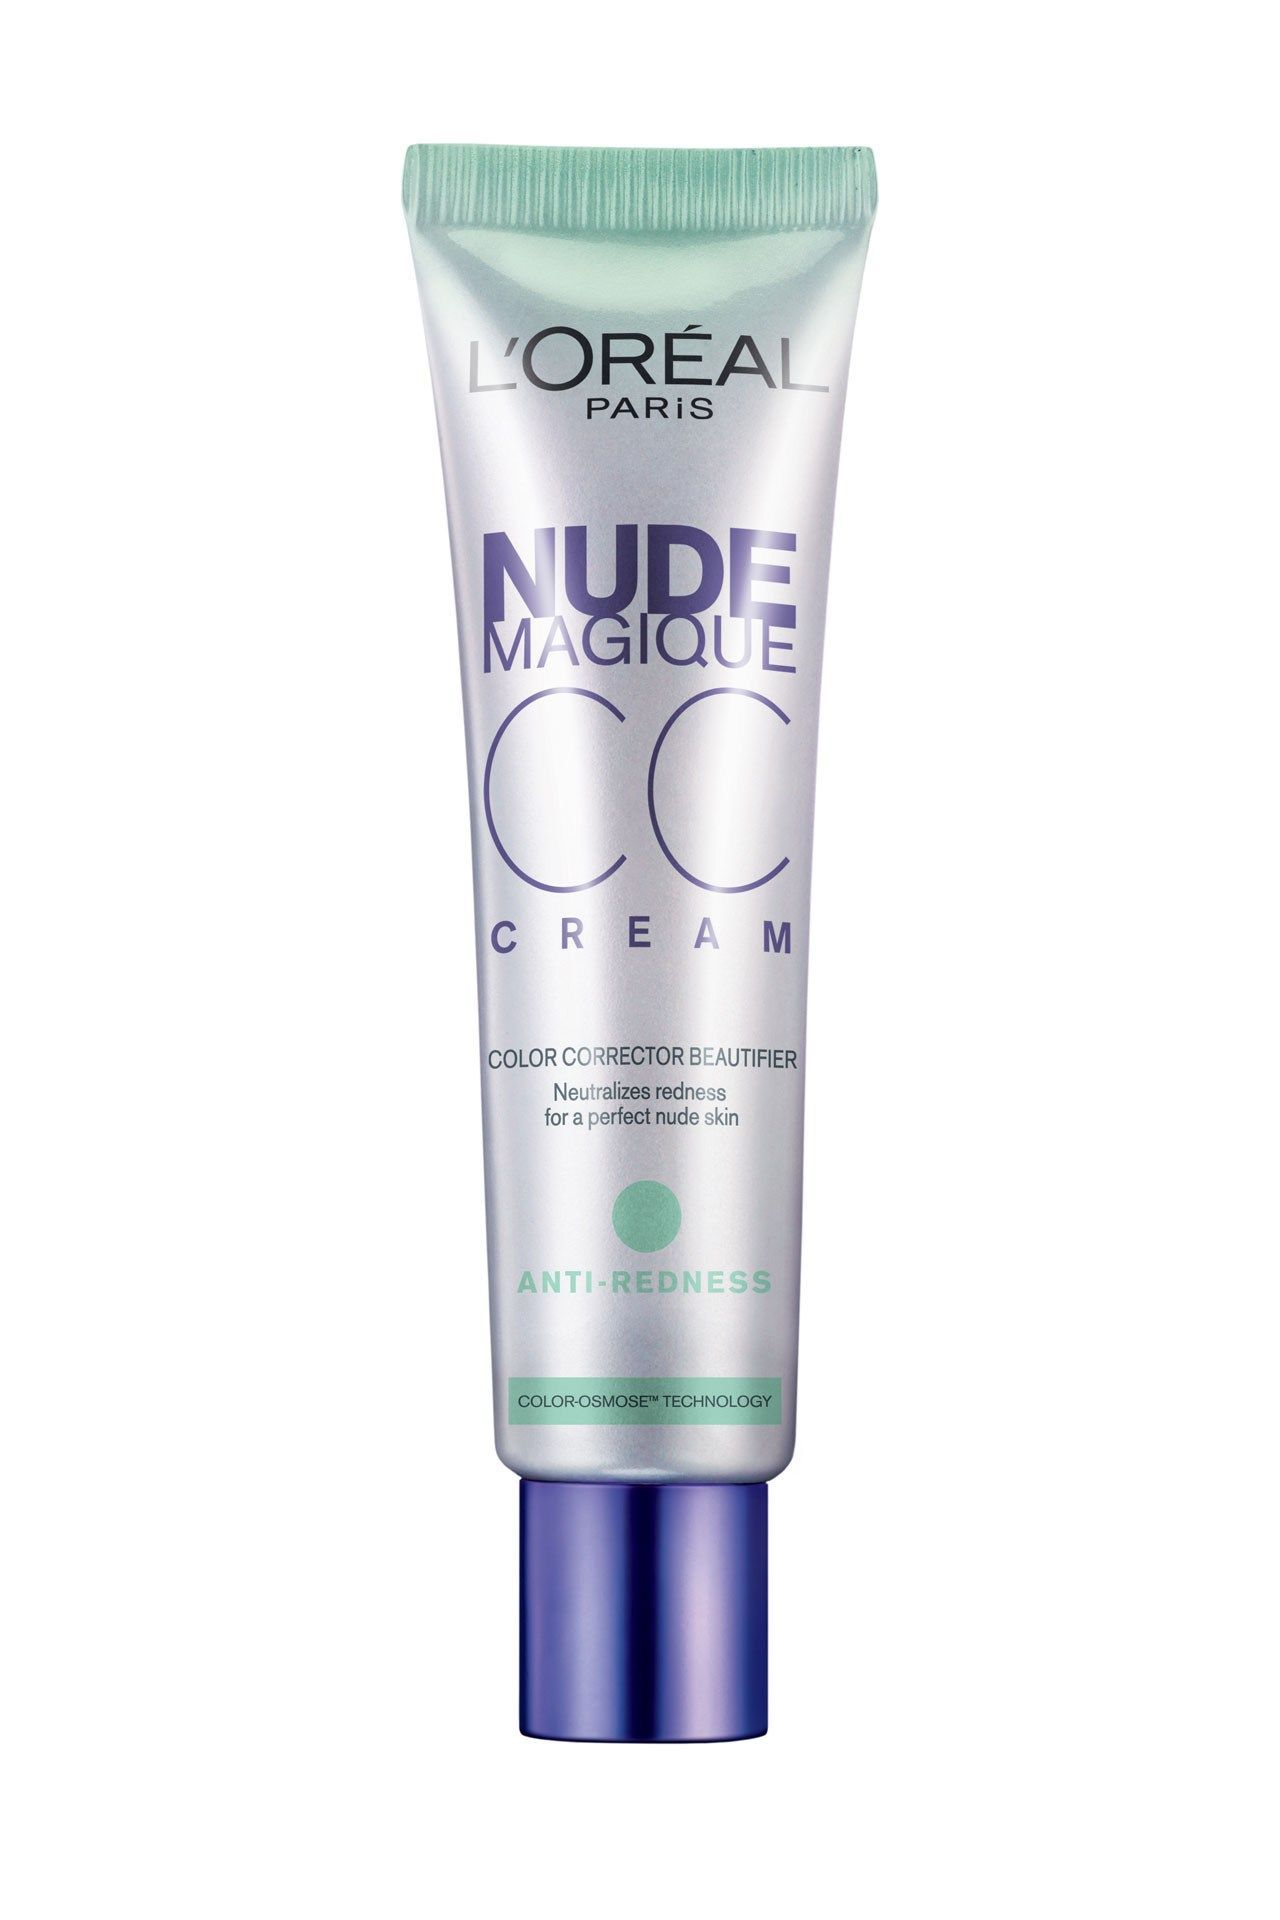 LOreal Paris Nude Magique CC Cream Review and Swatches